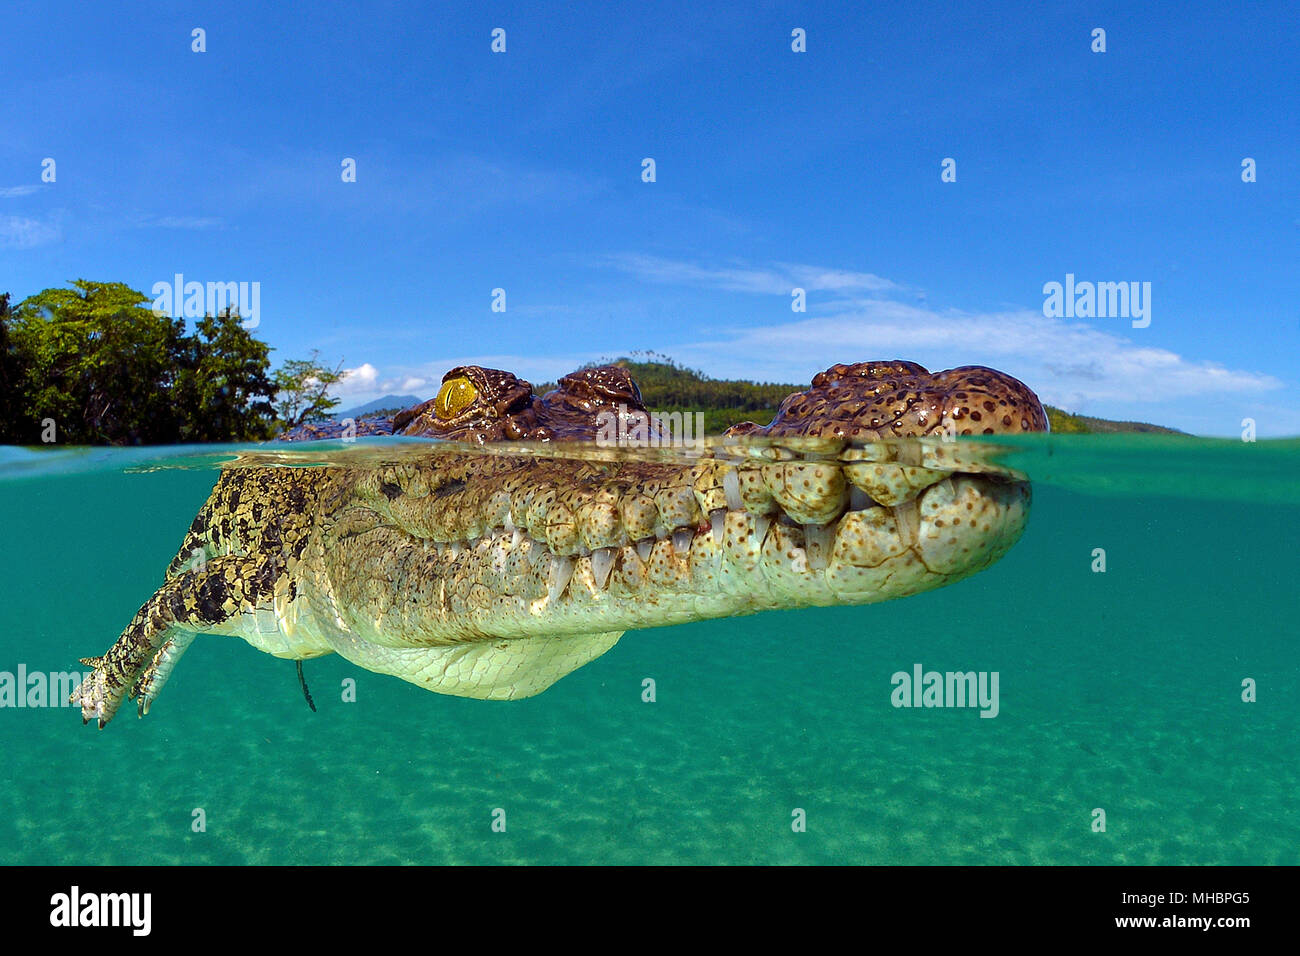 Saltwater crocodile (Crocodylus porosus), Underwater, Split-Level image, Kimbe Bay, West New Britain, Papua New Guinea - Stock Image